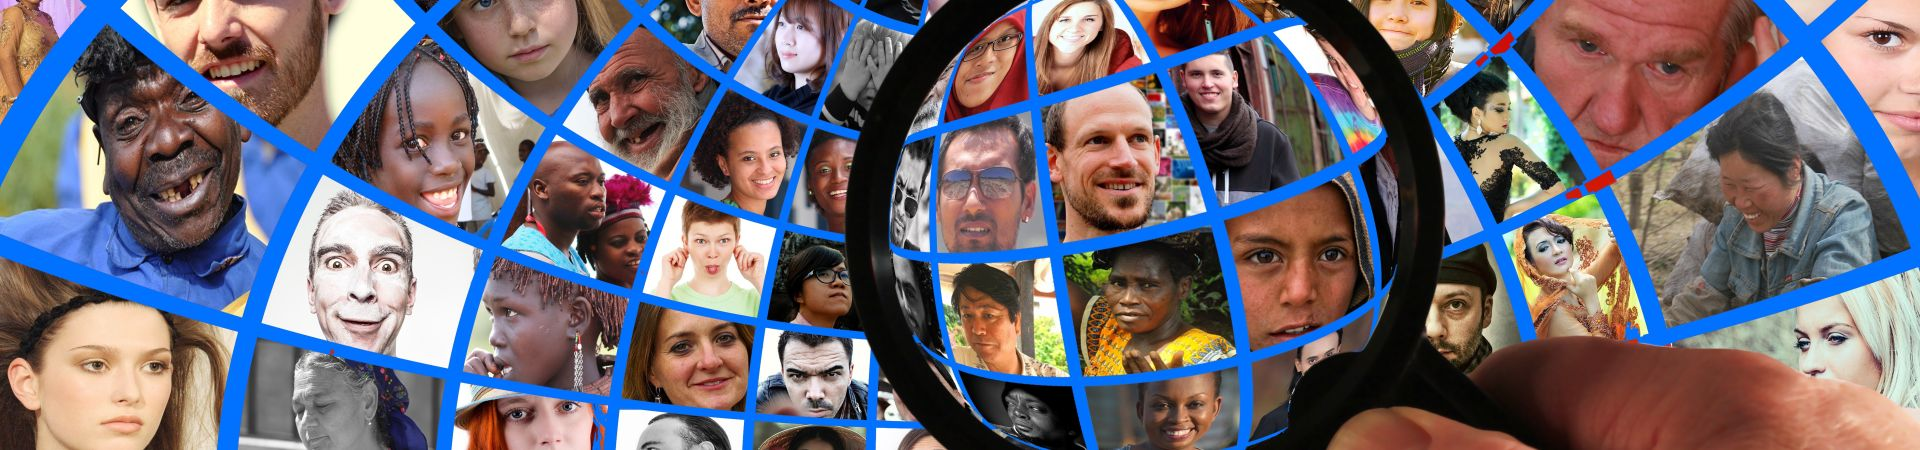 Wereldbol met gezichten en vergrootglas ivm privacyverklaring. Foto Gerd Altmann pixabay